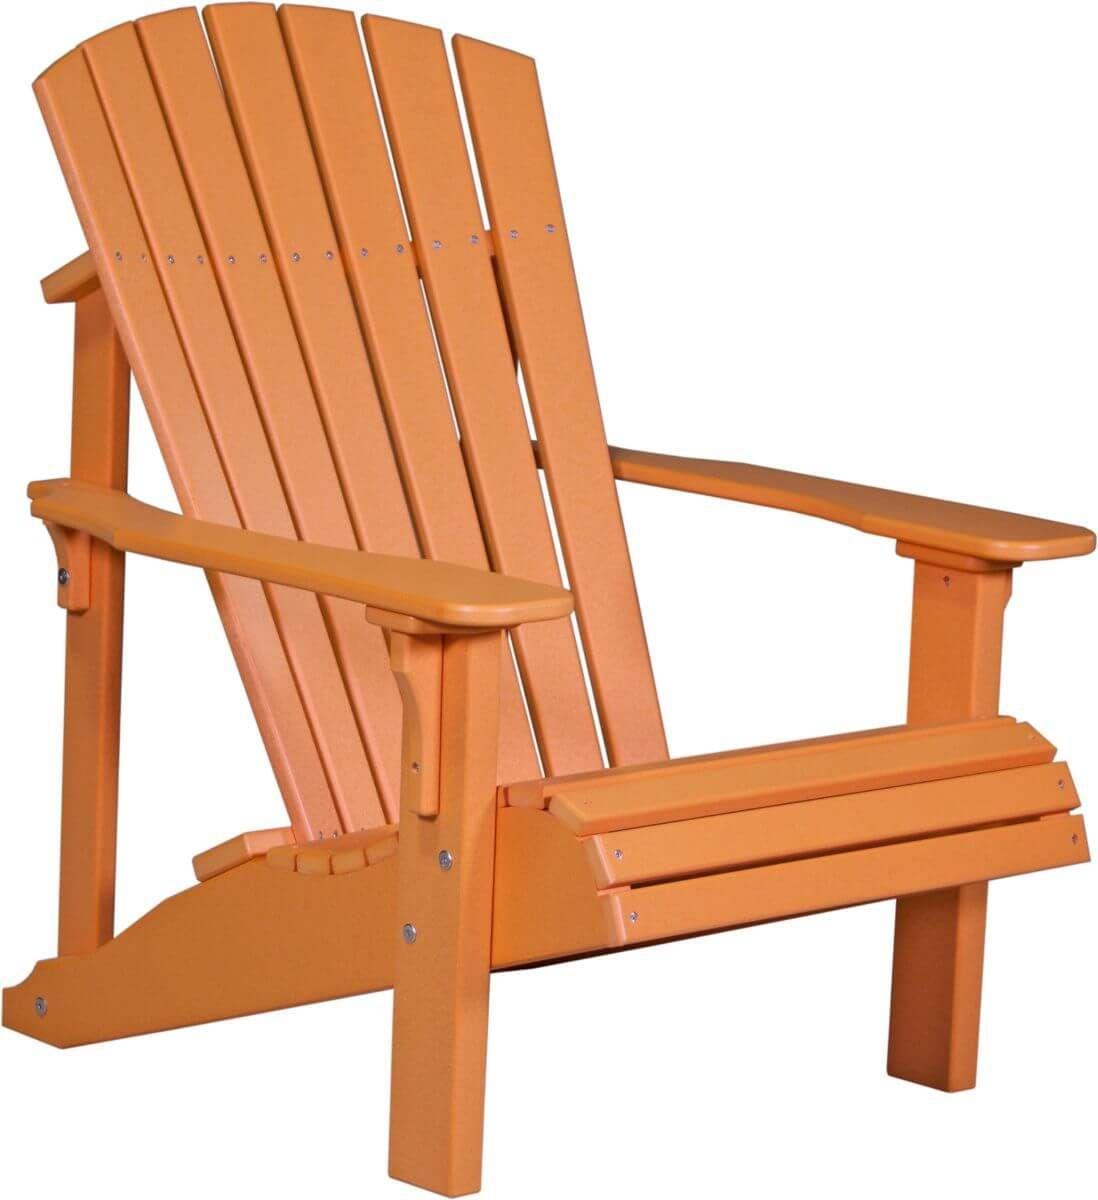 Tangerine Rockaway Adirondack Chair